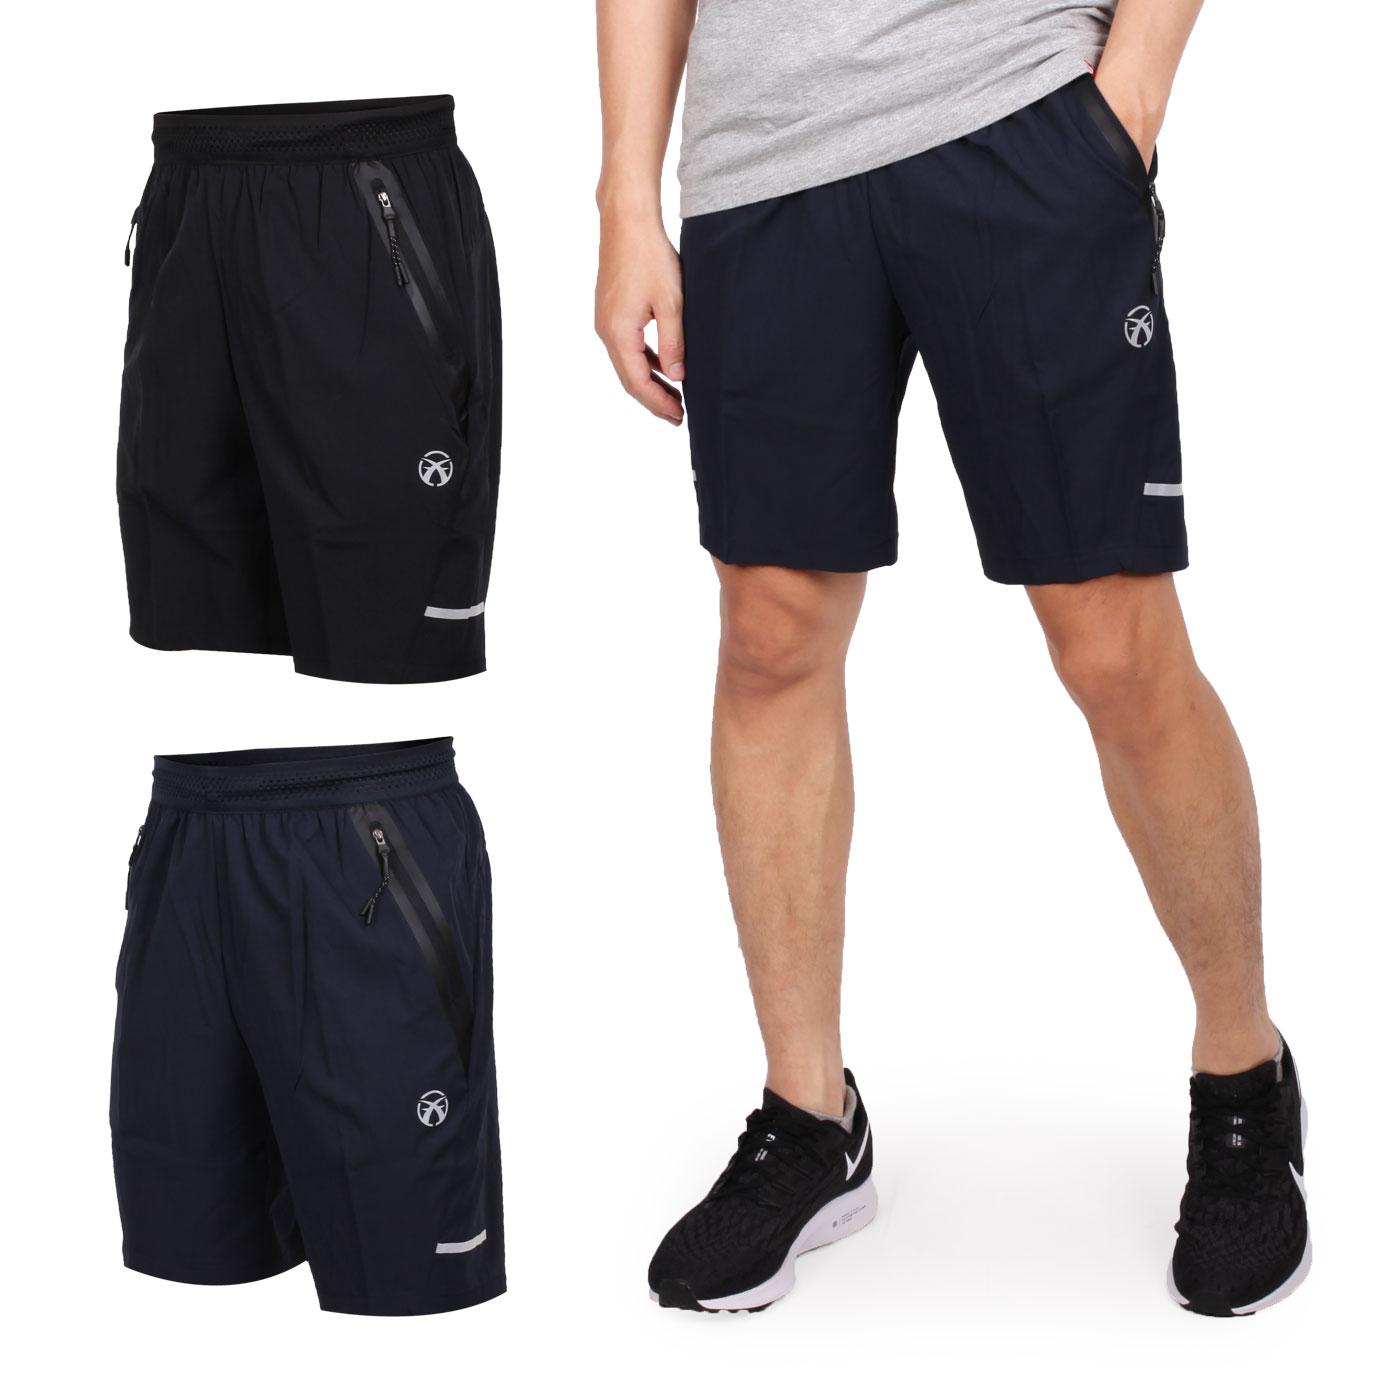 FIRESTAR 男彈性平織短褲 C9216-10